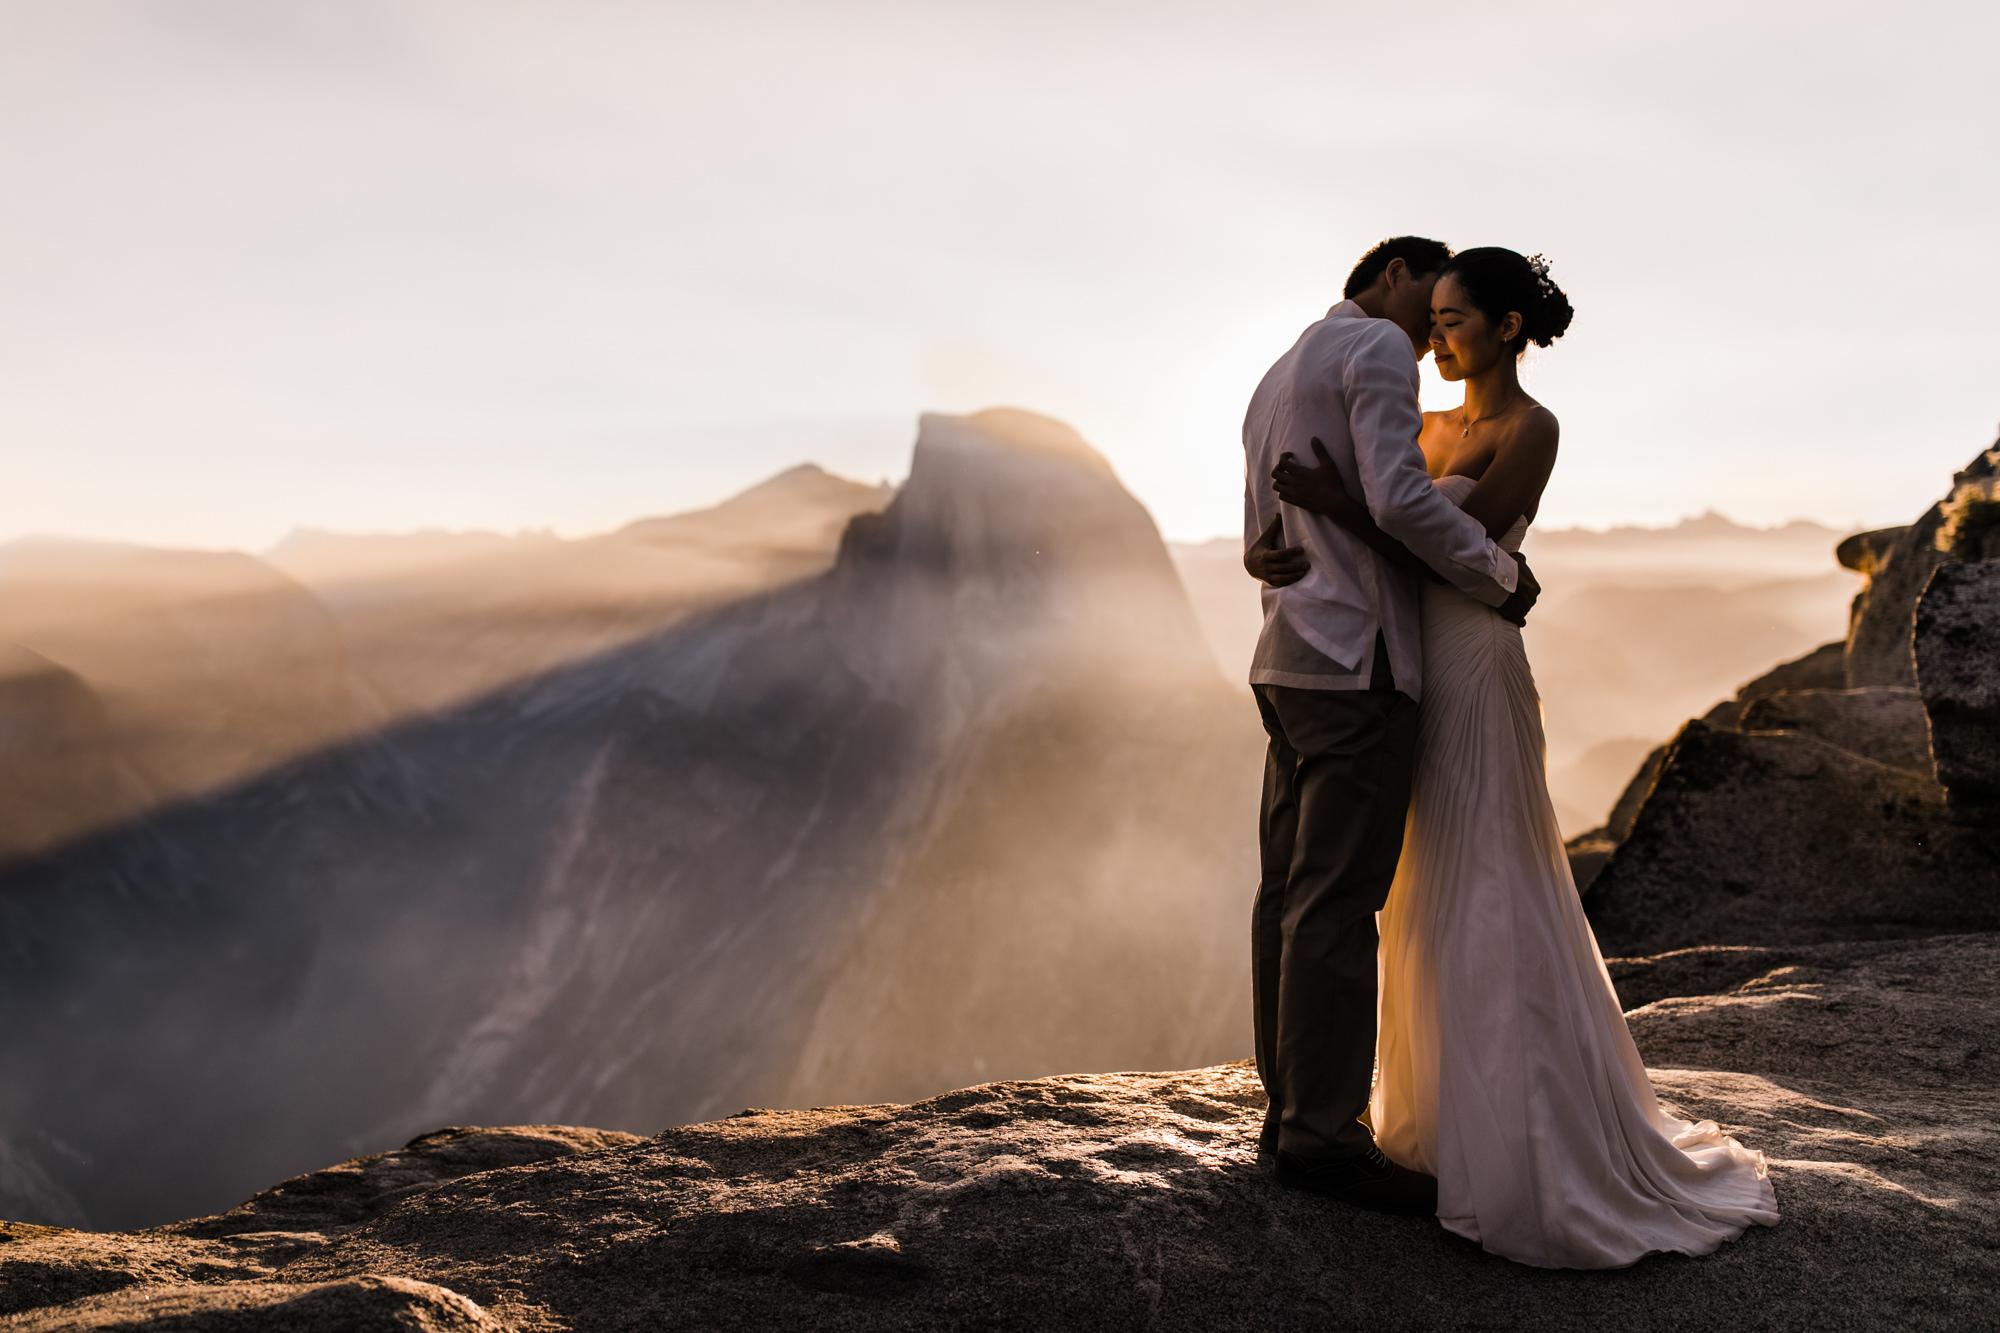 sunrise adventure elopement in yosemite national park | destination adventure wedding photographers | the hearnes adventure photography | www.thehearnes.com